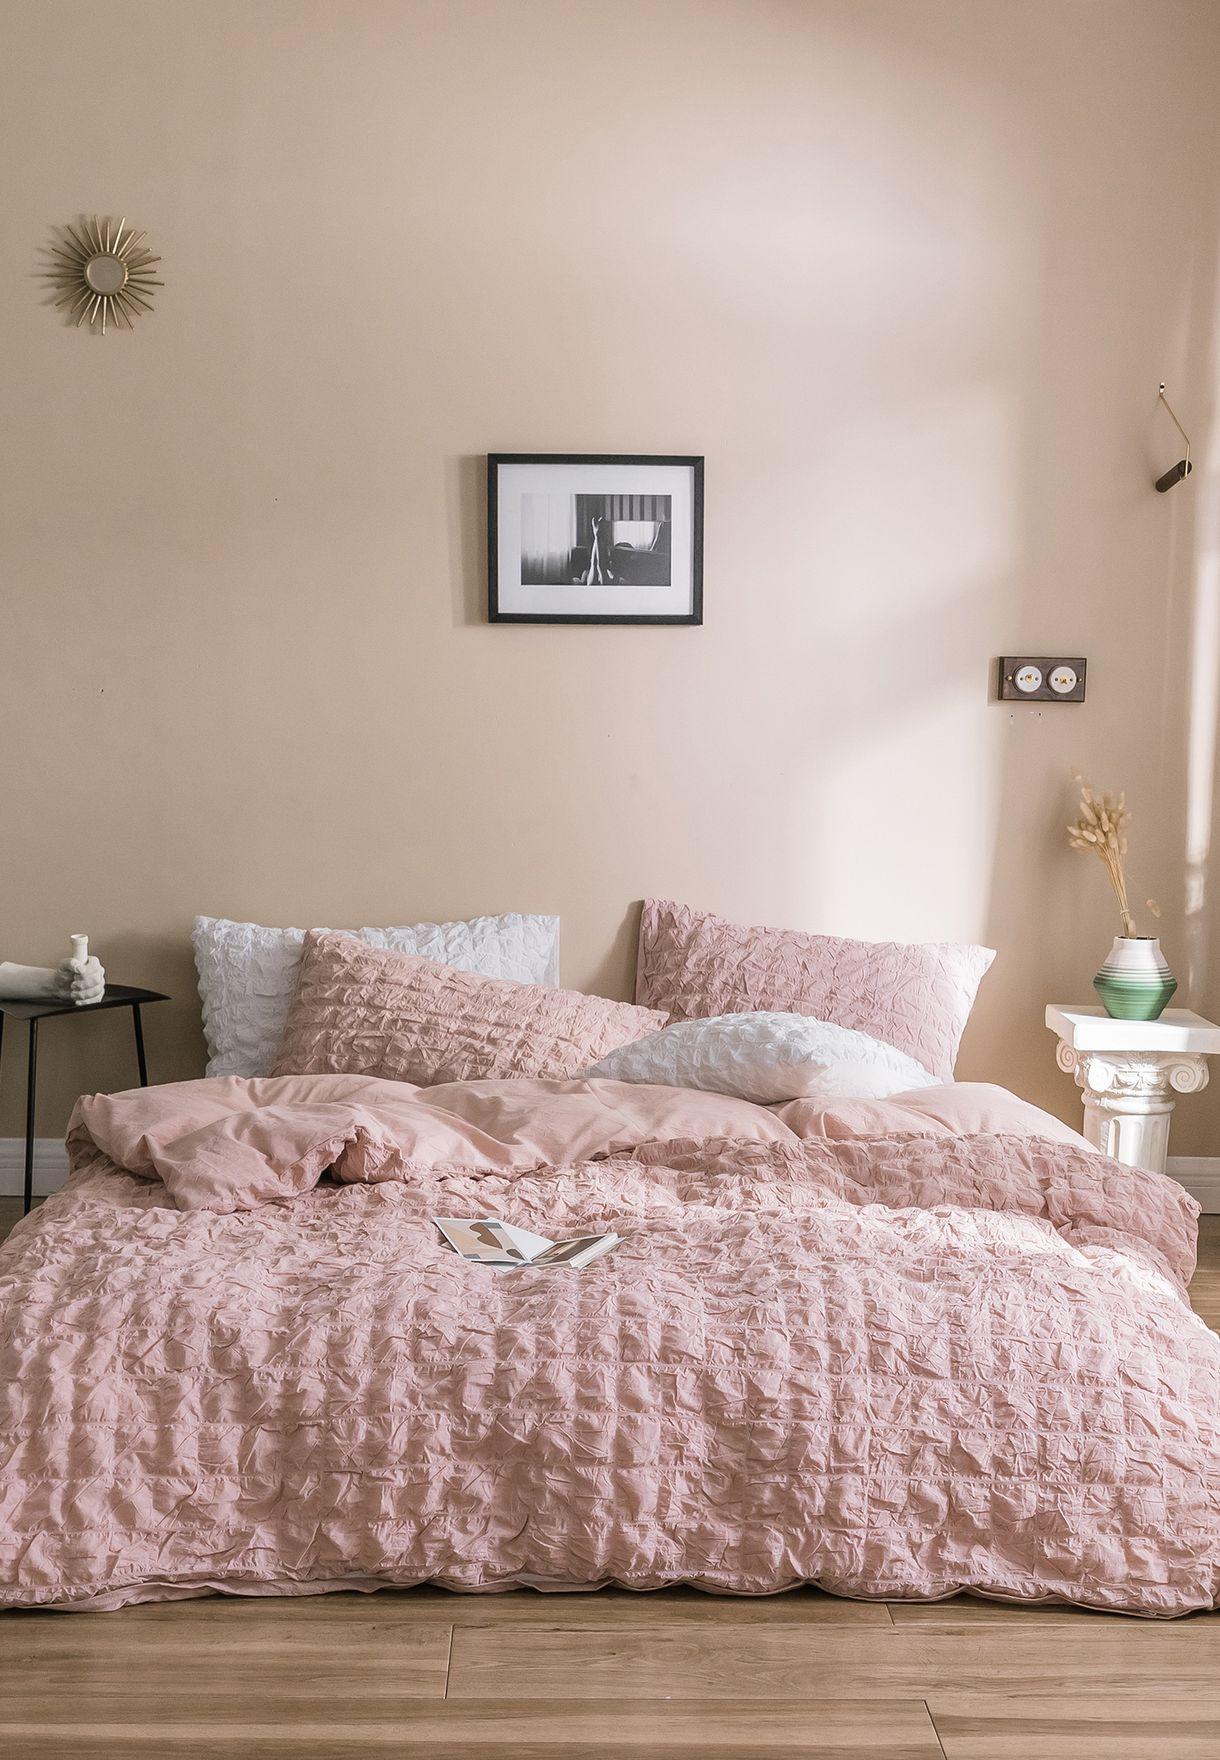 طقم شراشف سرير كينغ 200 × 230 سم